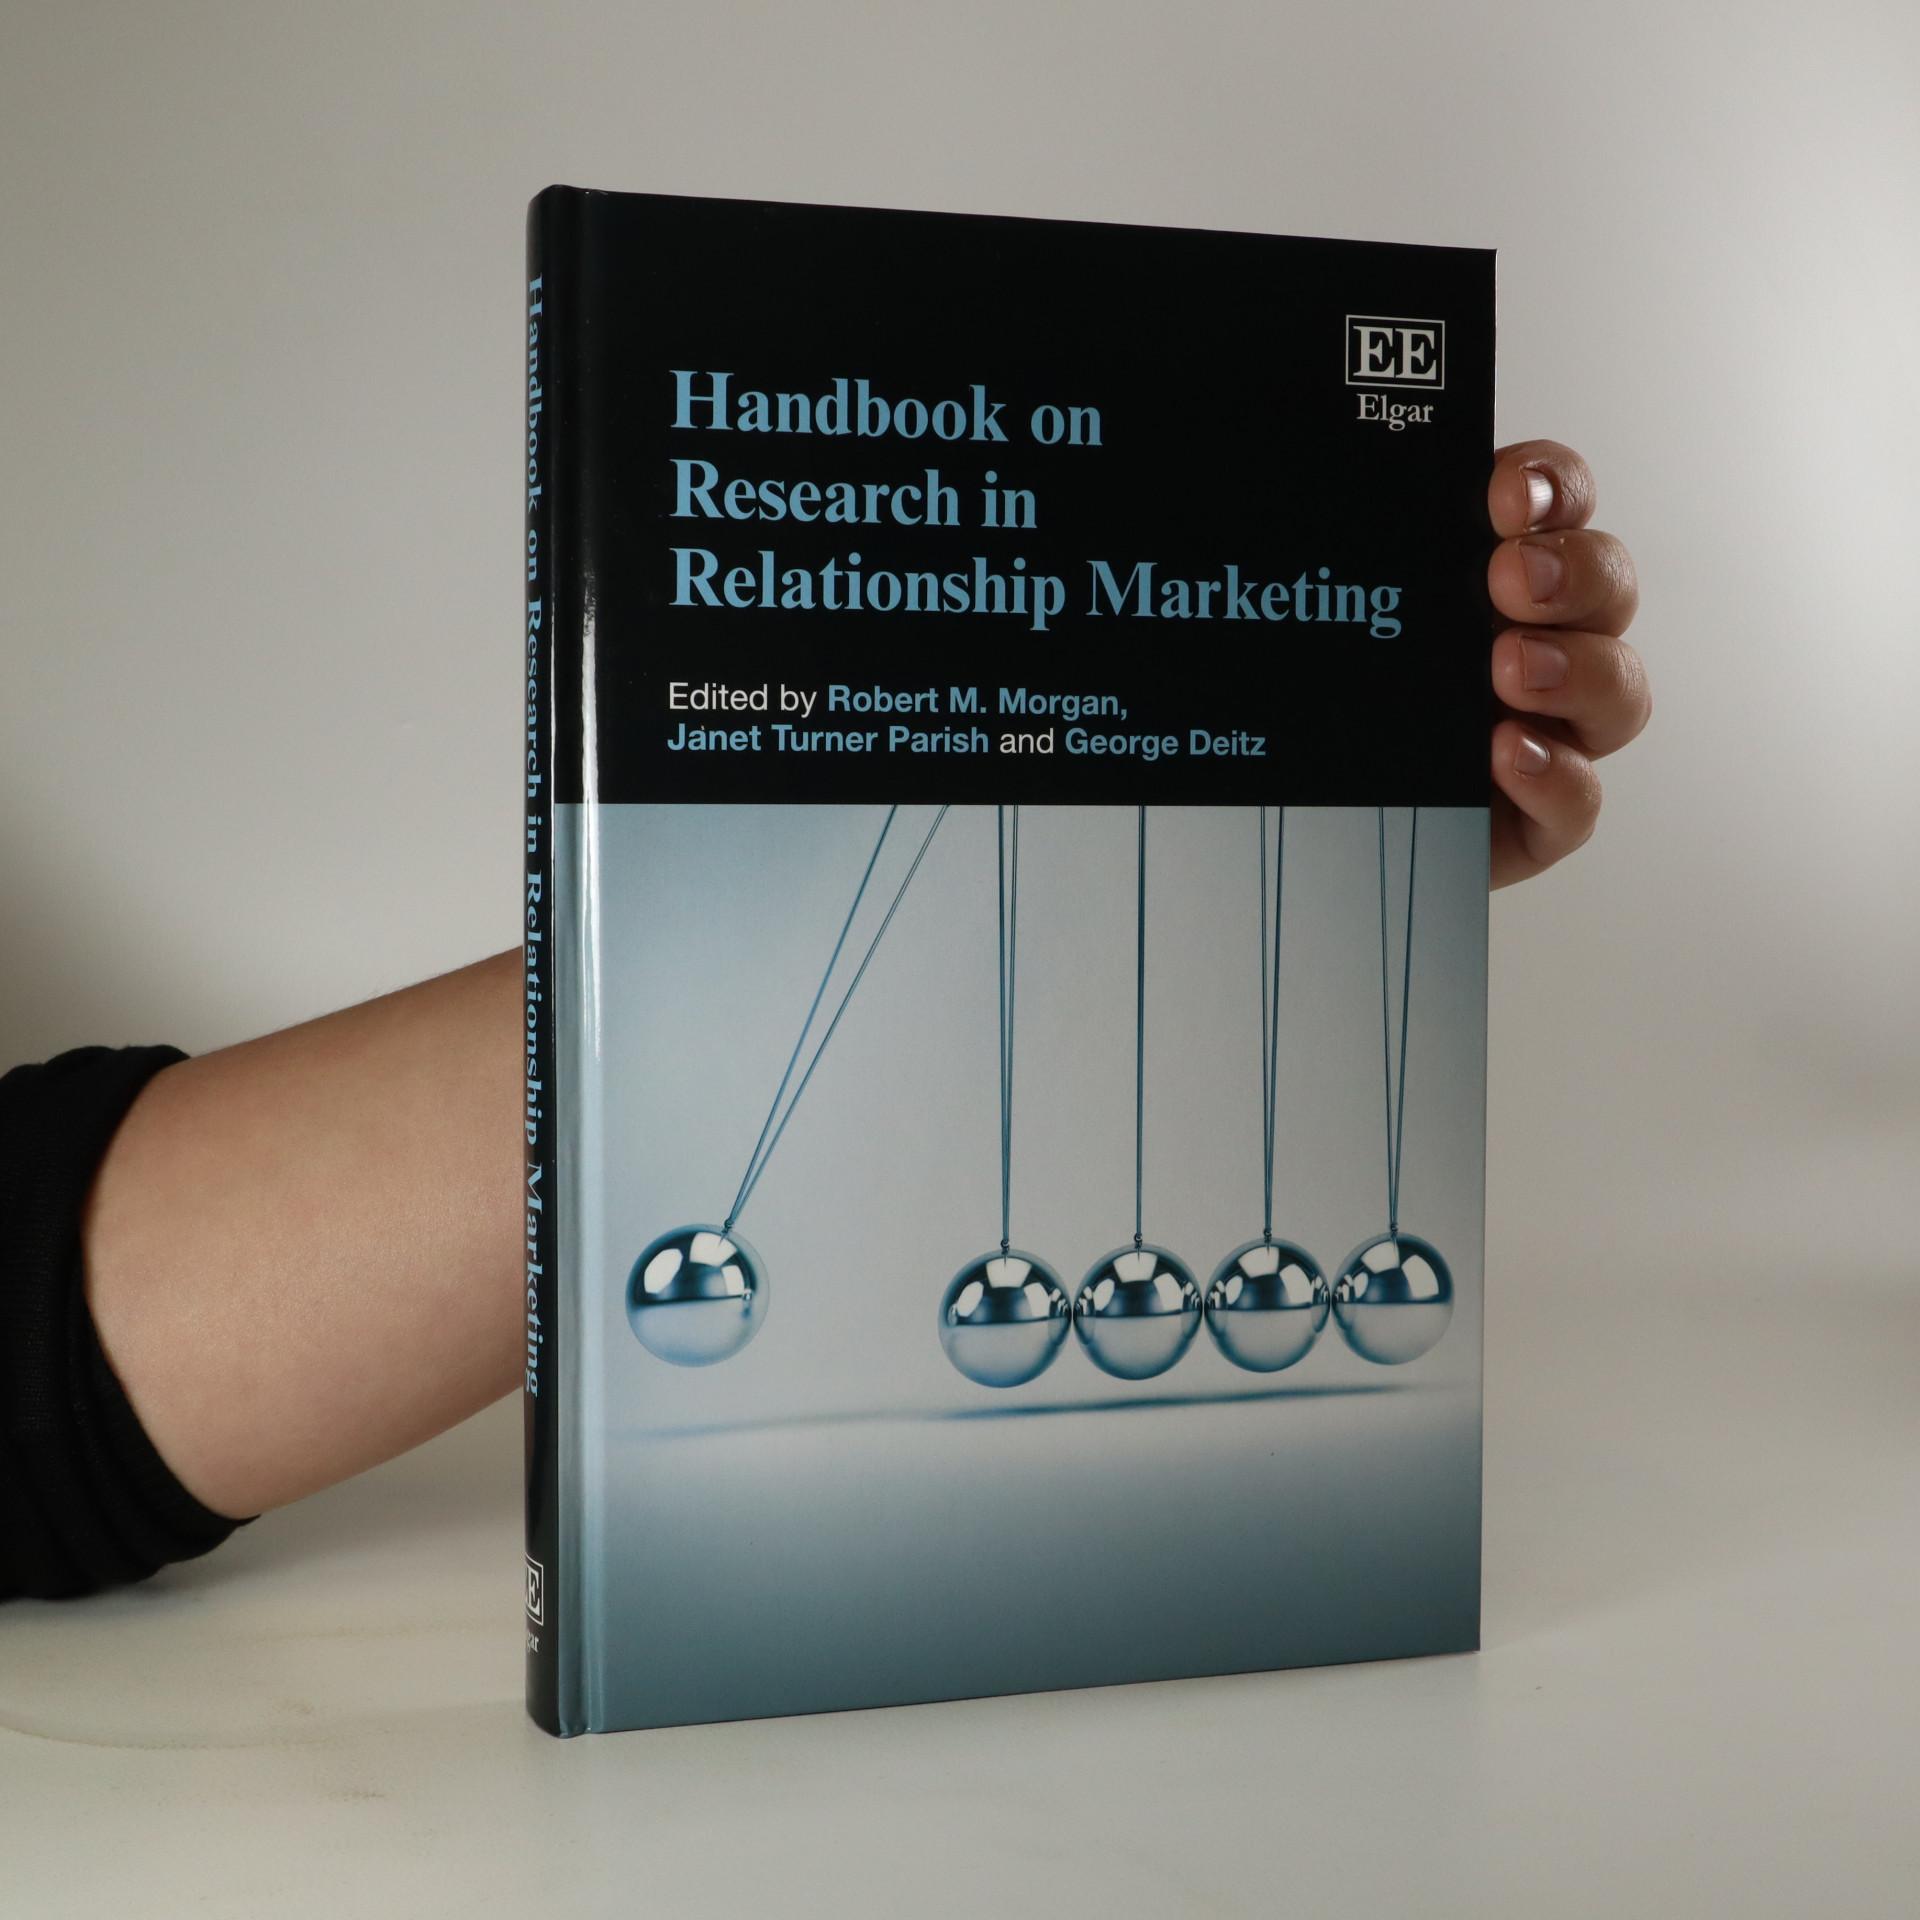 antikvární kniha Handbook on Research in Relationship Marketing, neuveden